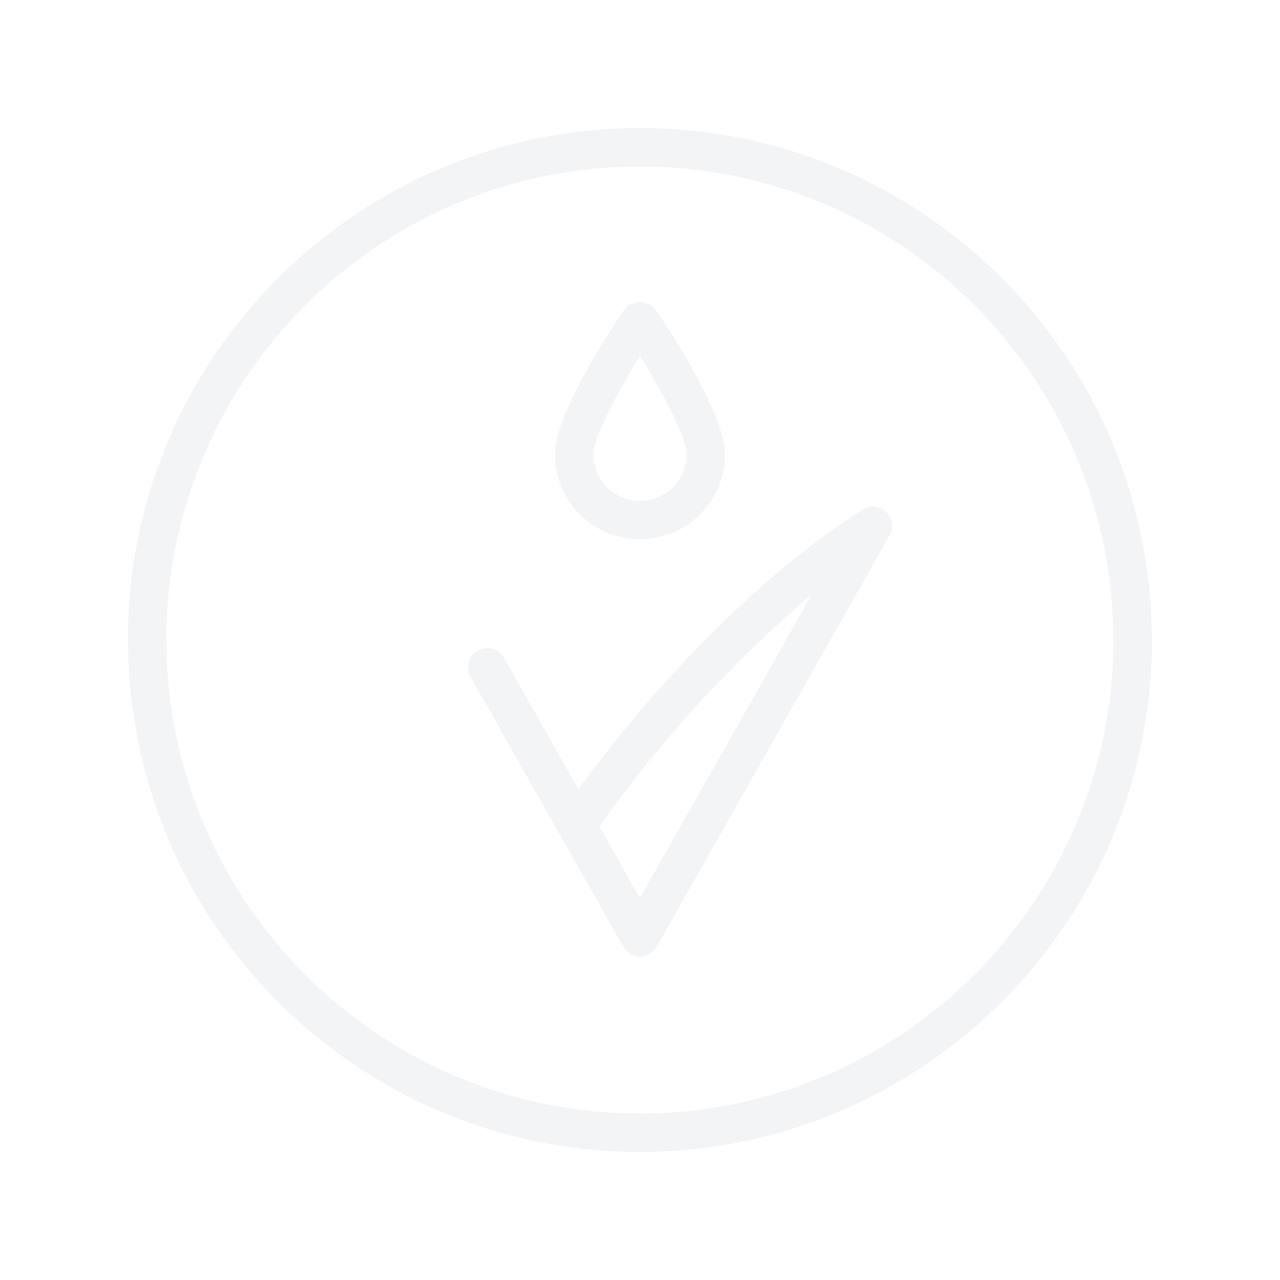 DR. HAUSCHKA карандаш для губ Definer No.00 Прозрачный 1.14g